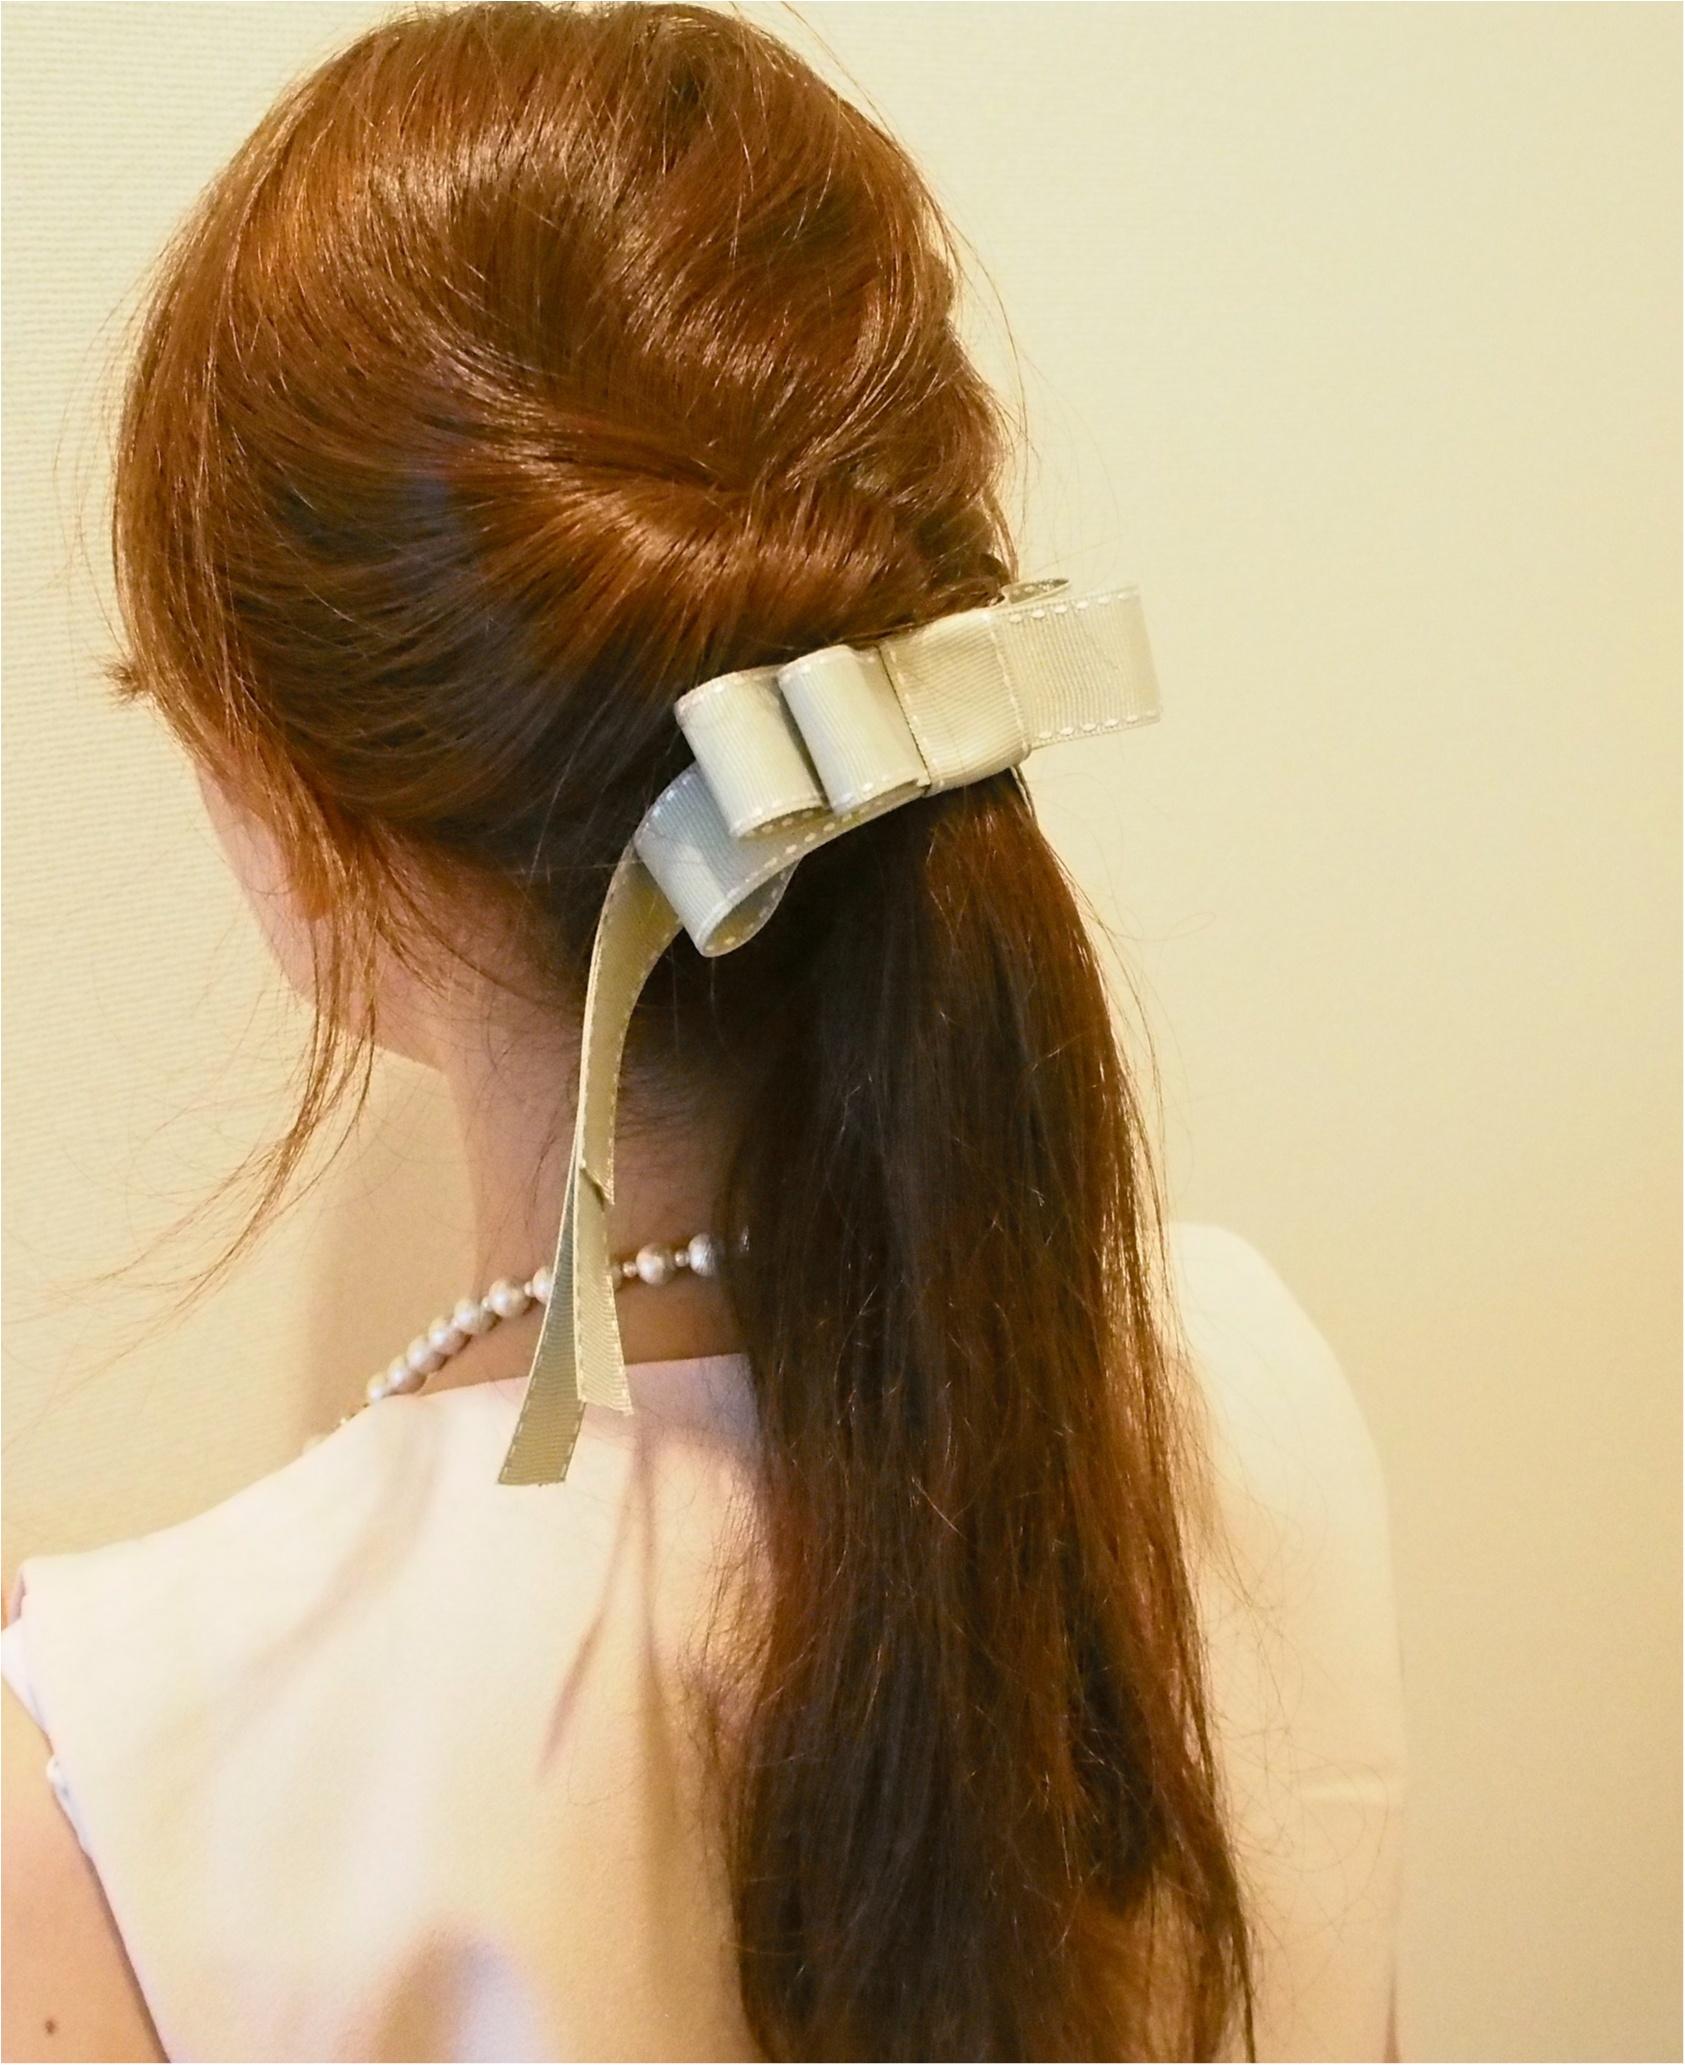 Ribbon Couture Riche(リボンクチュールリッシュ)という資格があるのはご存知ですか?早速私も資格を取りに行ってきました。_5